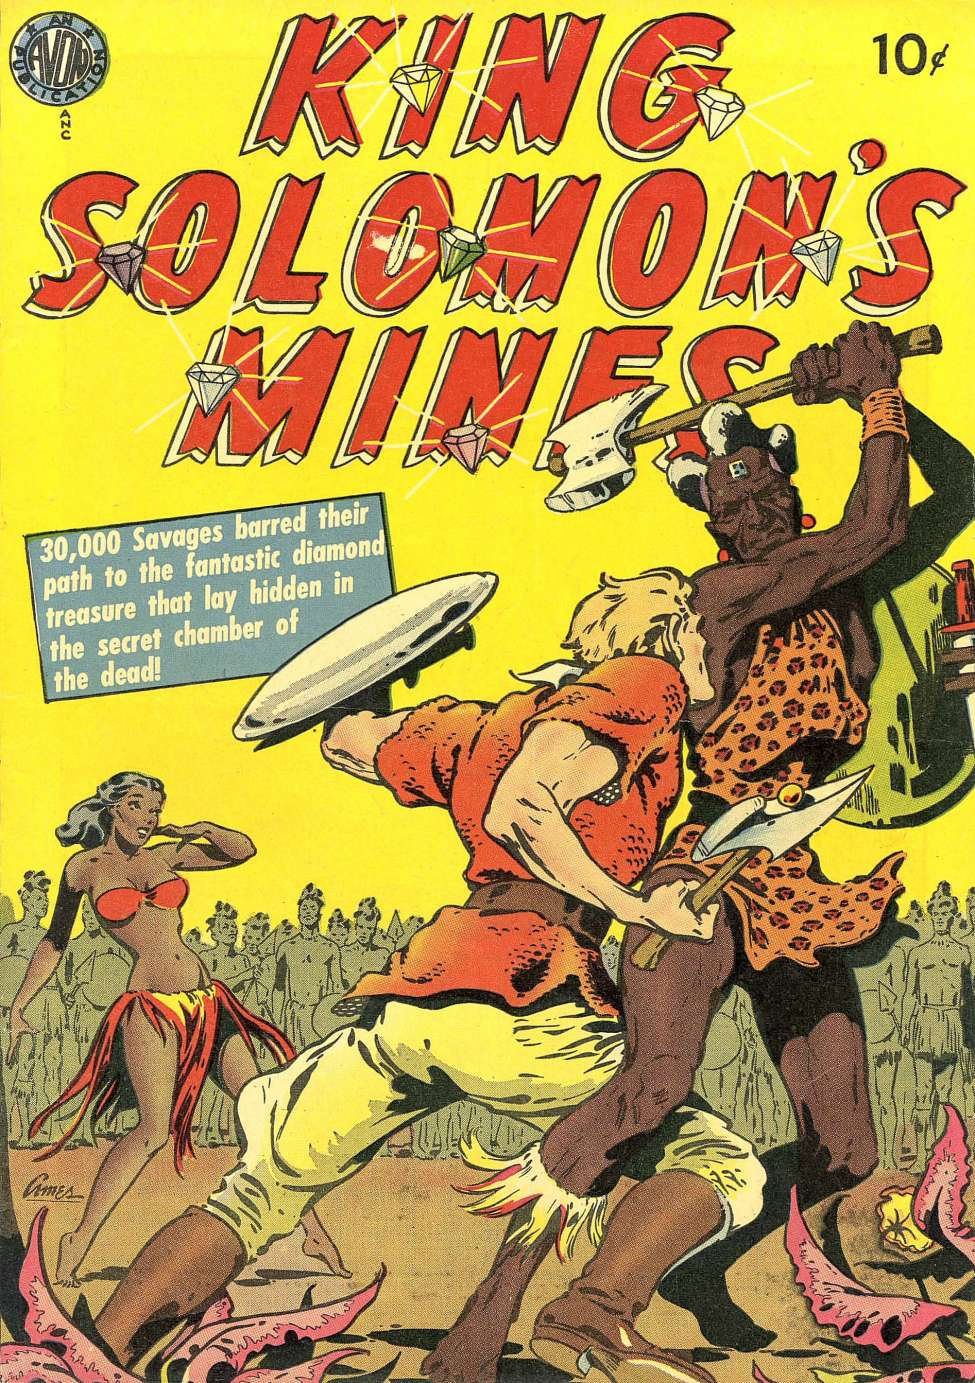 Comic Book Cover For King Solomon's Mines (nn)